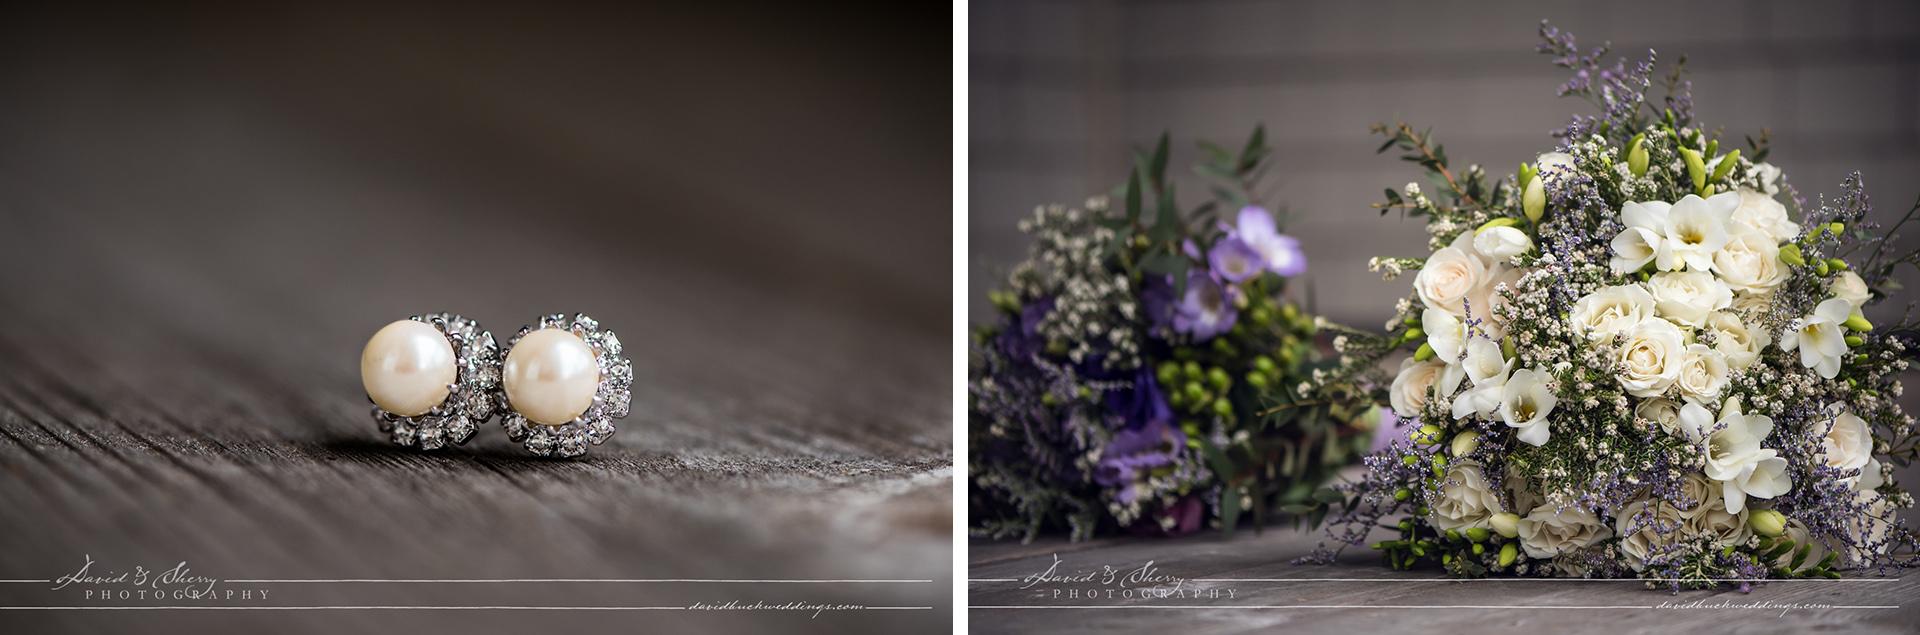 Cobble_Beach_Wedding_Photography_06